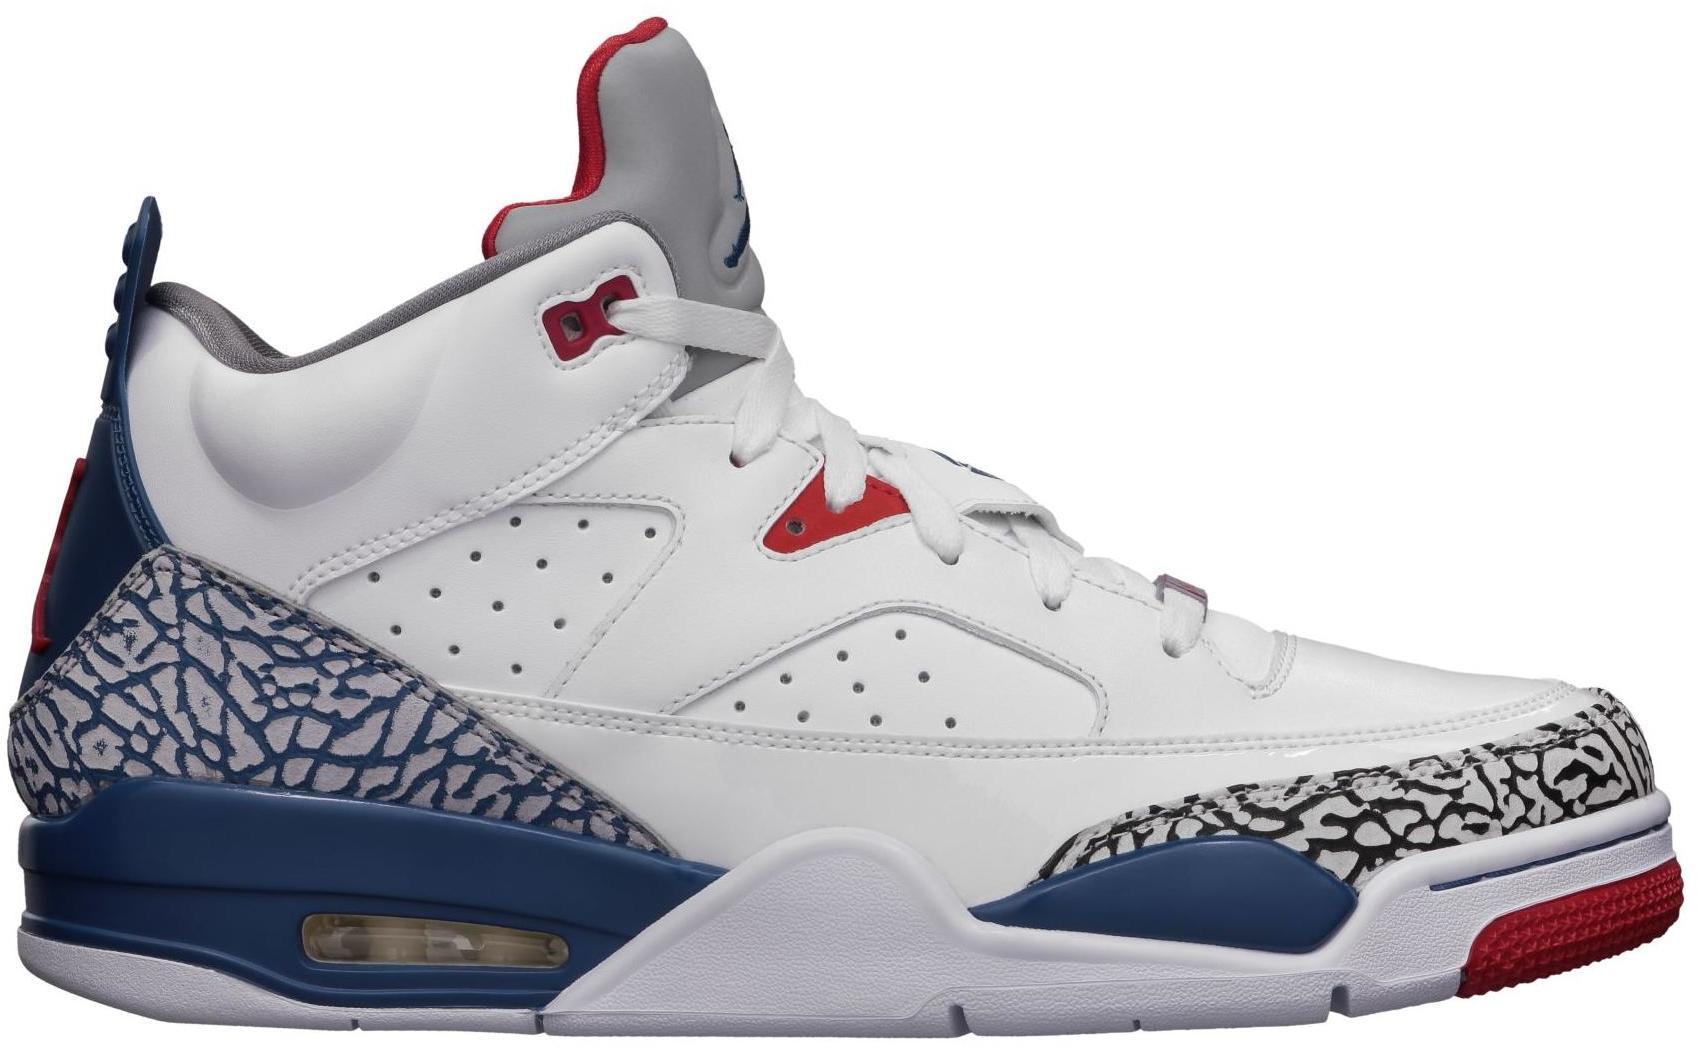 Jordan Son of Mars Low True Blue